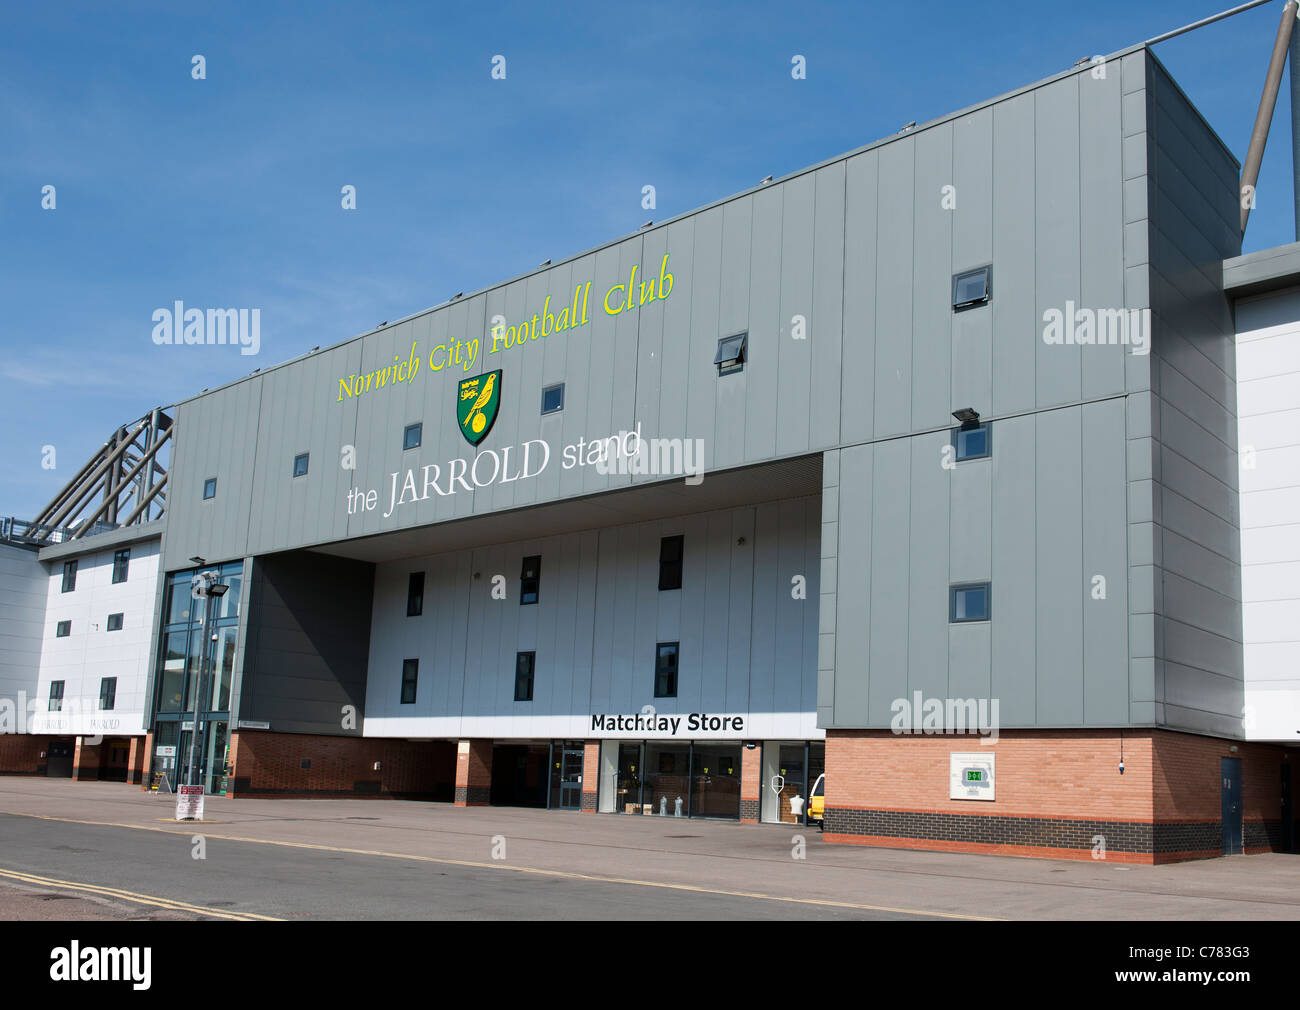 The Jarrold Stand, Carrow Road Stadium, Norwich City Football Club, Norwich, Norfolk, East Anglia, England. - Stock Image